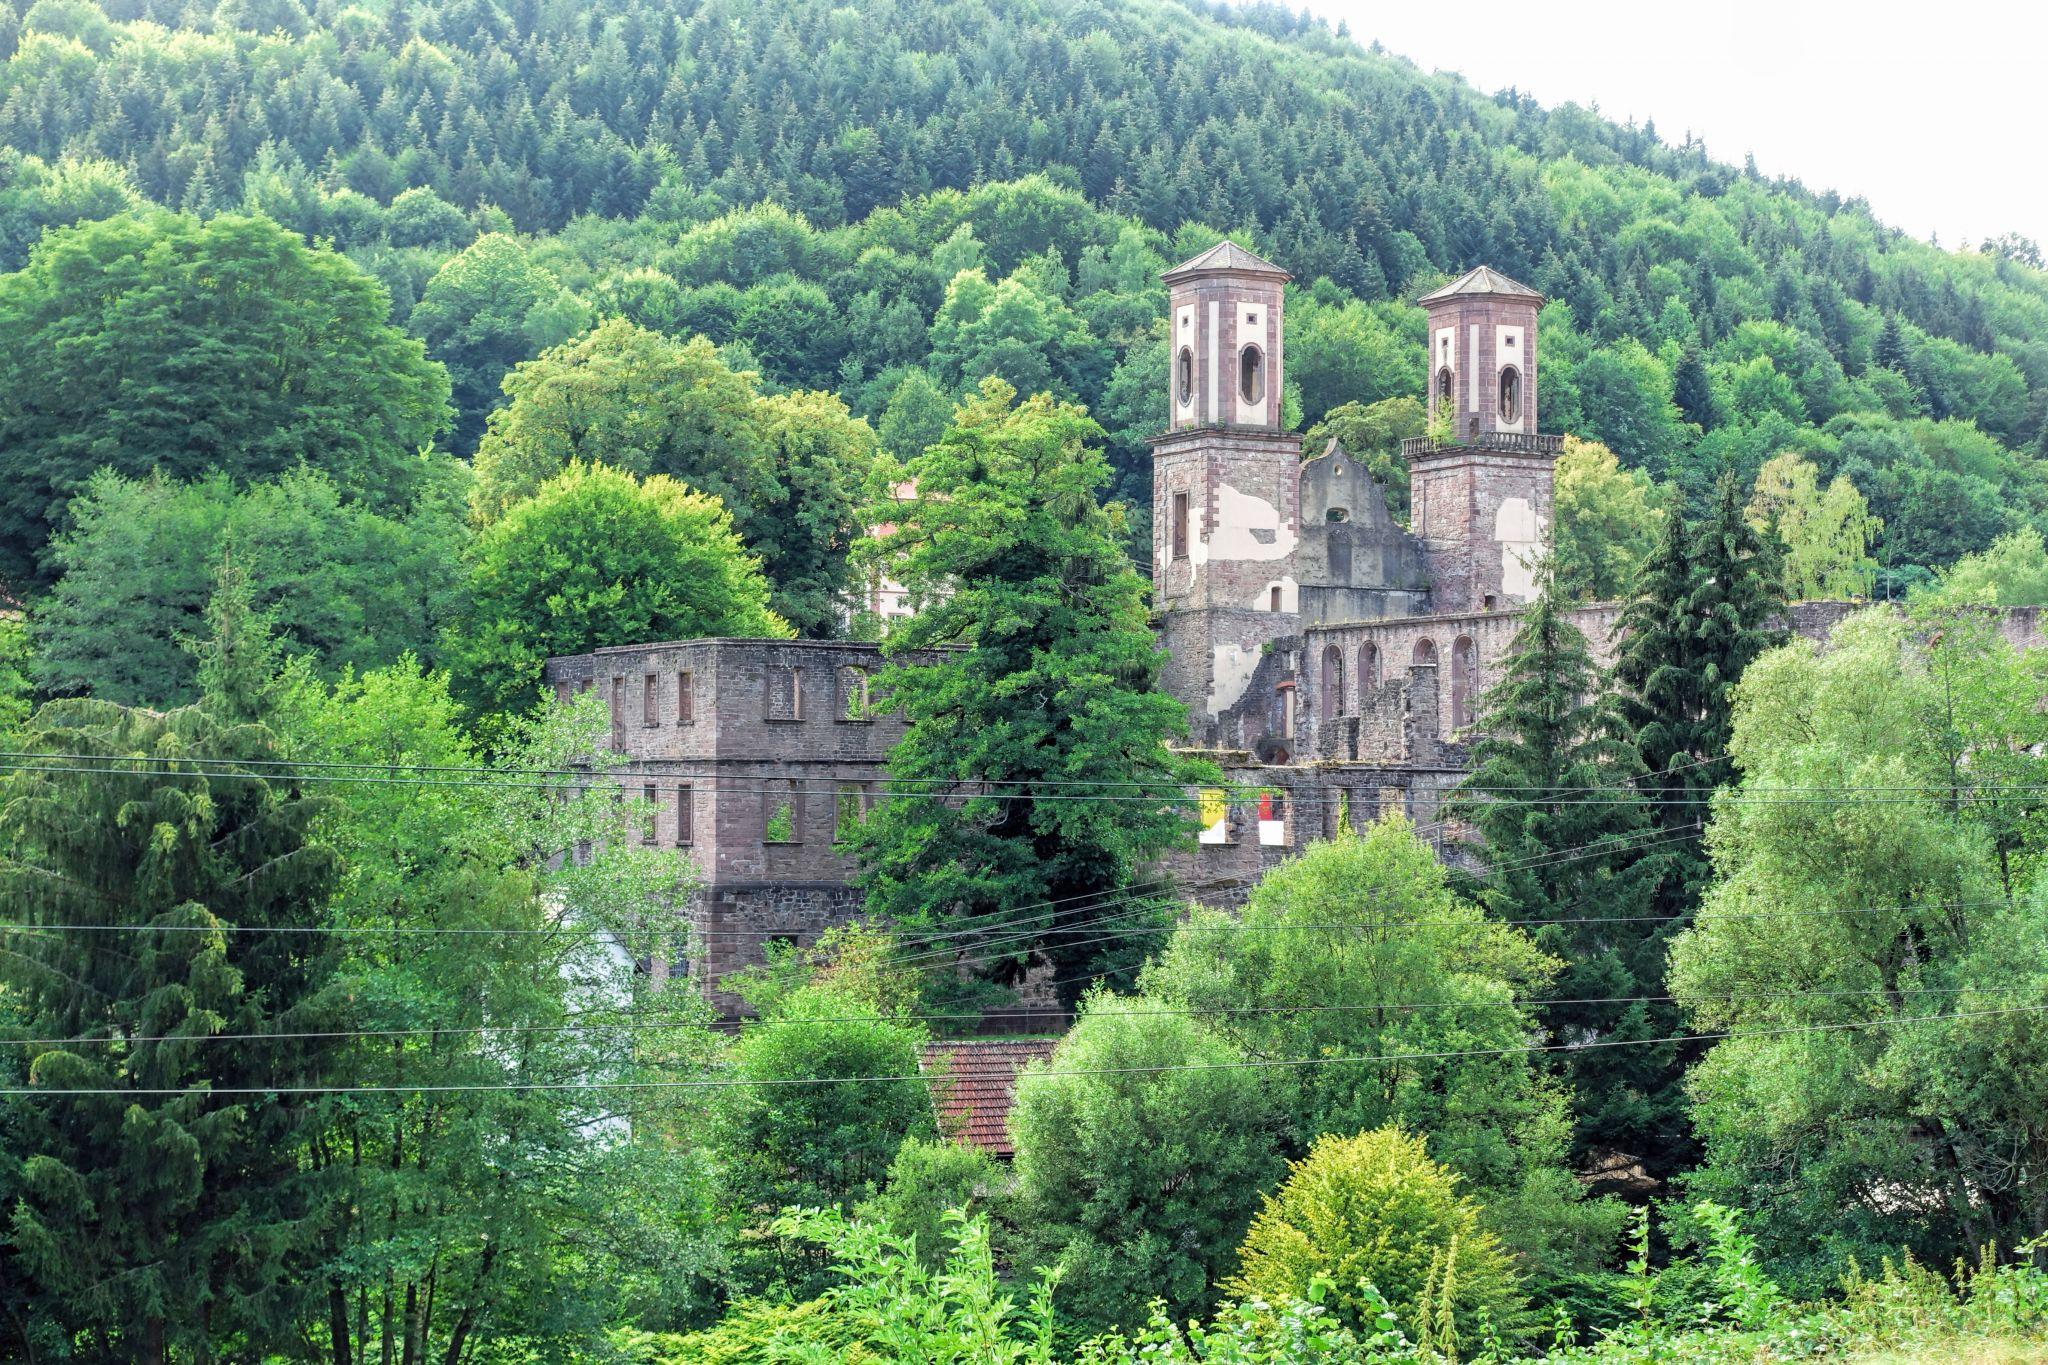 Klosterruine Frauenalb, Germany